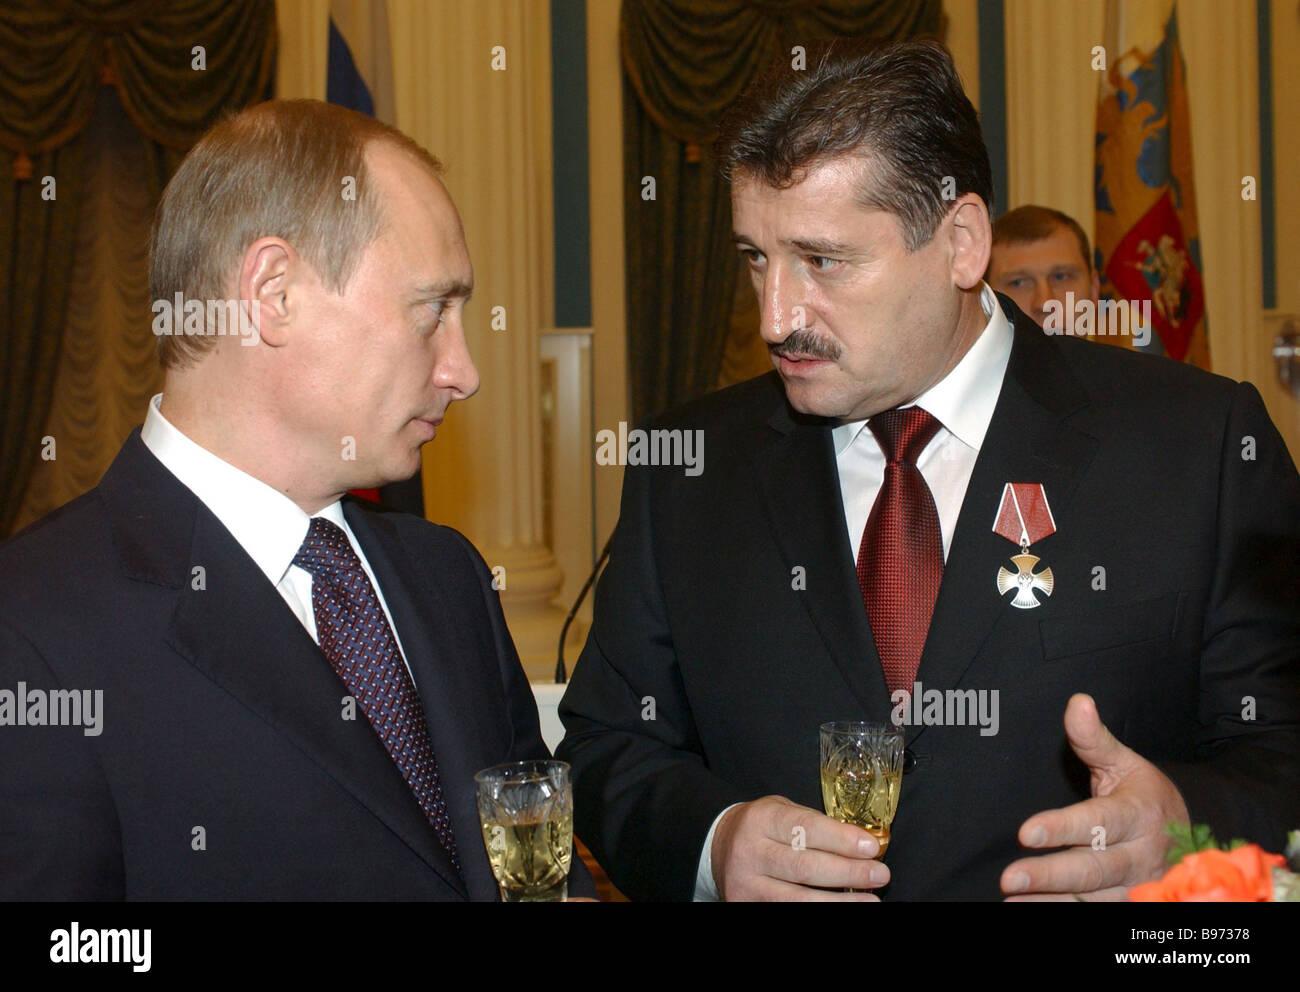 Russian President Vladimir Putin left and Chechen President Alu Alkhanov right in the Kremlin after the state awards - Stock Image